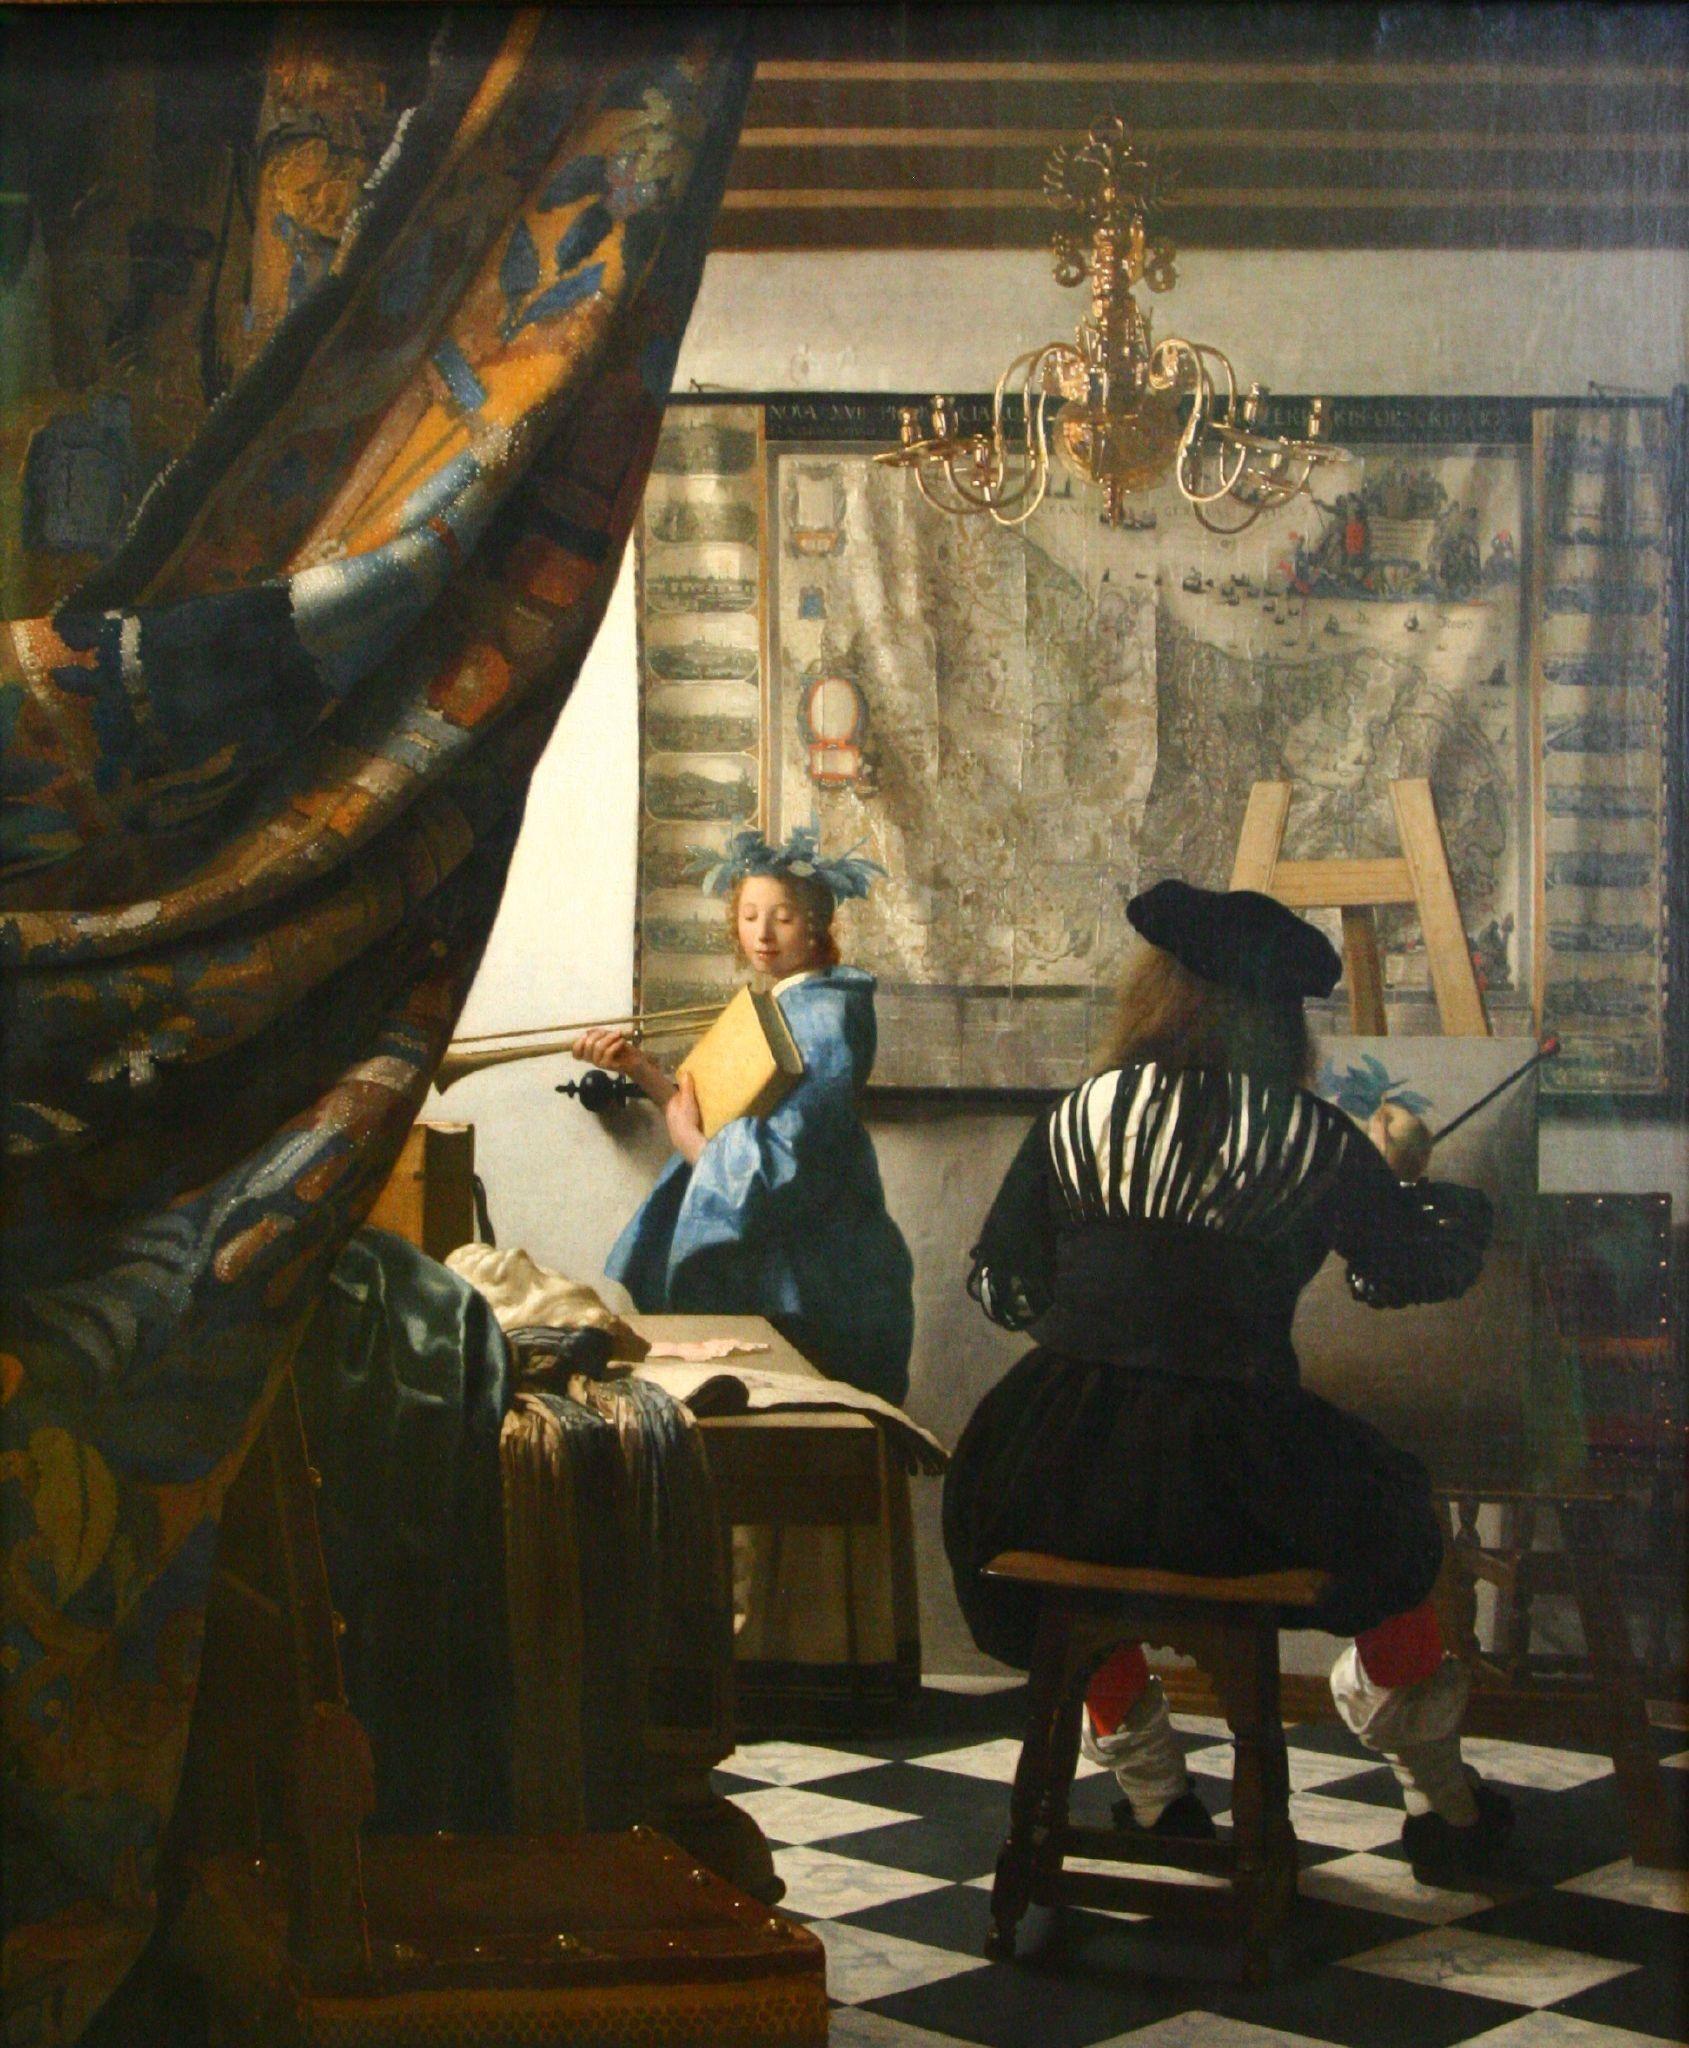 Vermeer allegory of painting one of my favorite paintings and